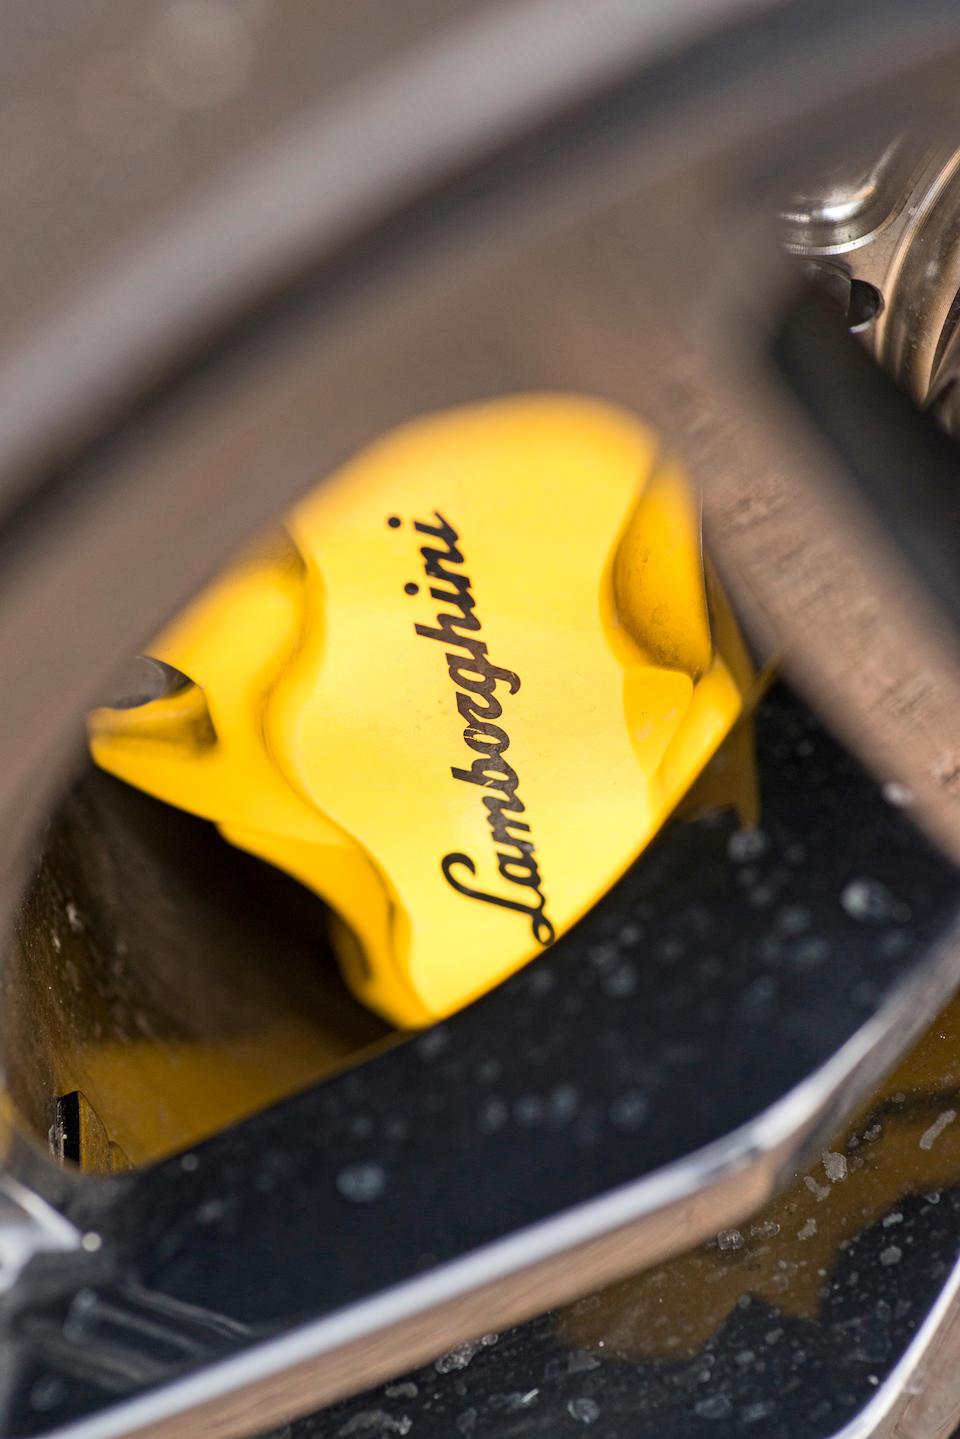 2009 Lamborghini Murciélago LP 670-4 Super Veloce Coupé  Chassis no. ZHWBE81H8ALA03817